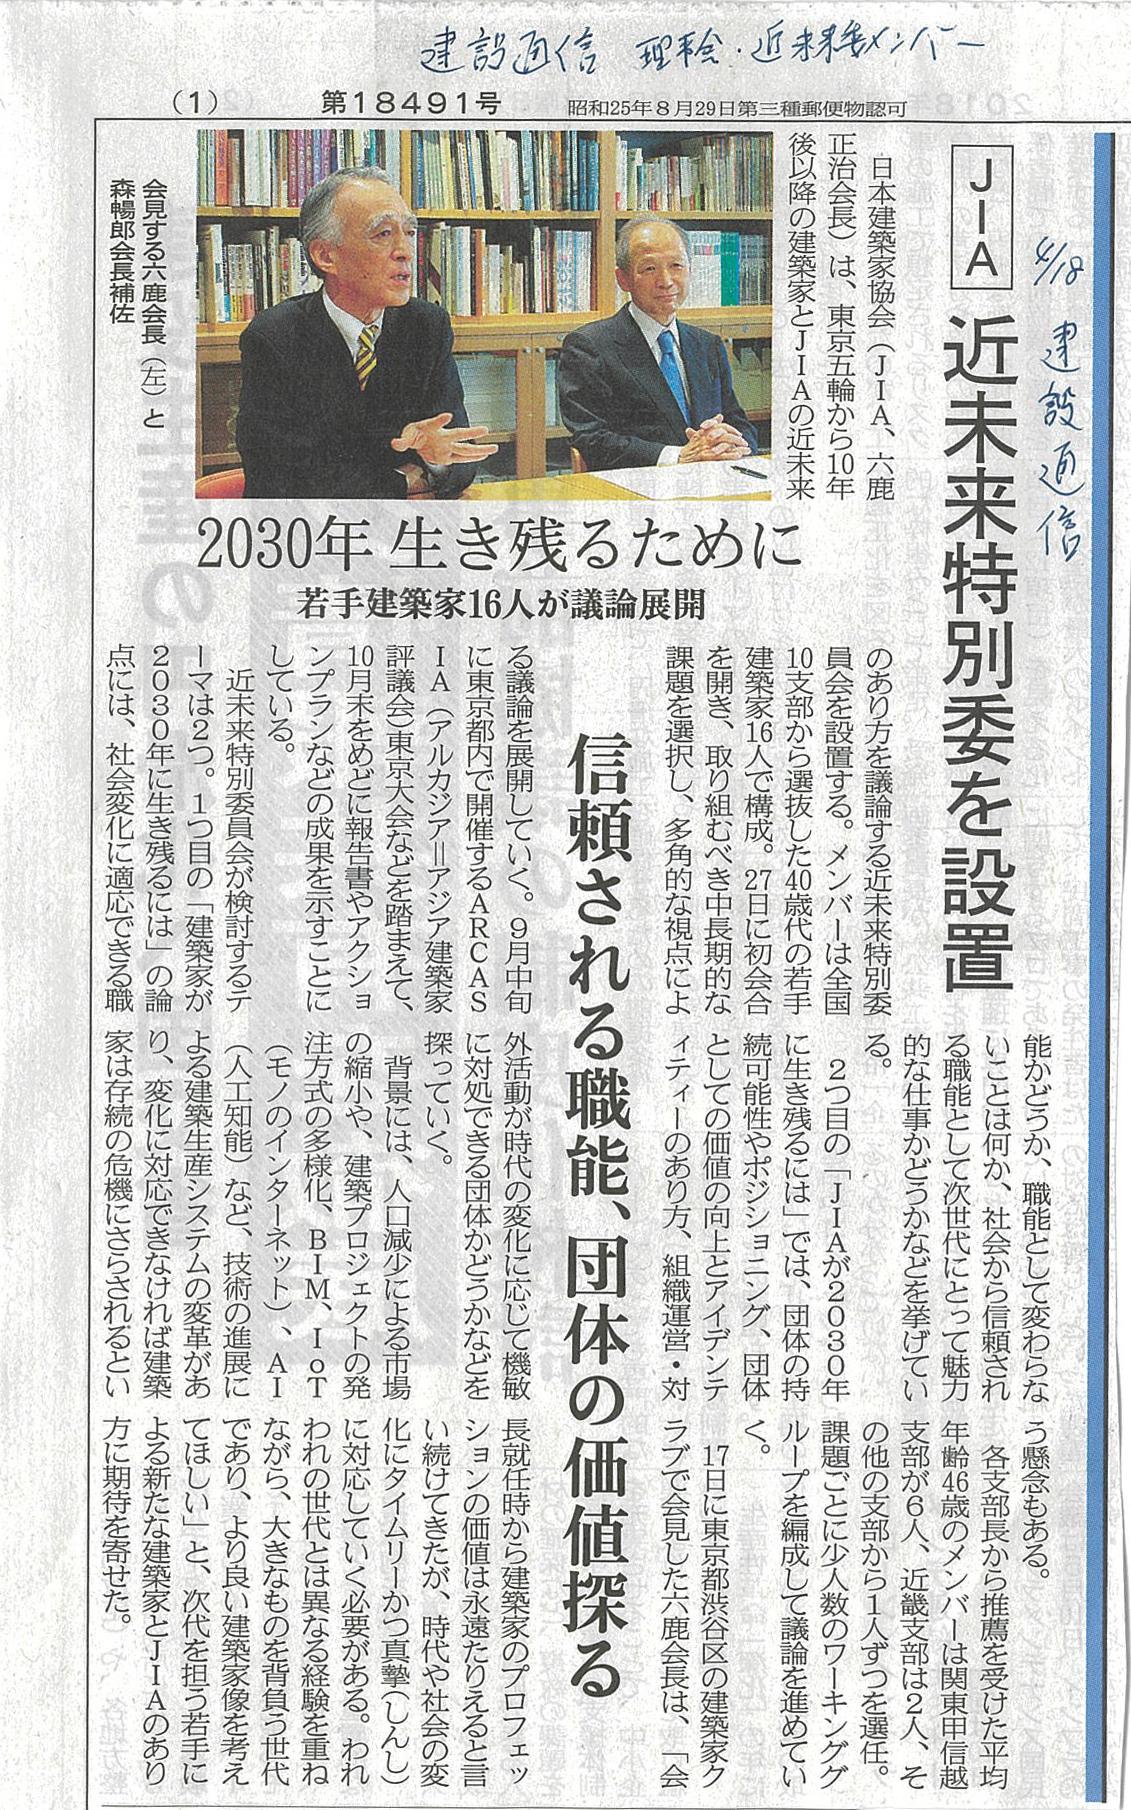 JIA近未来特別委を設置(20180418通信)